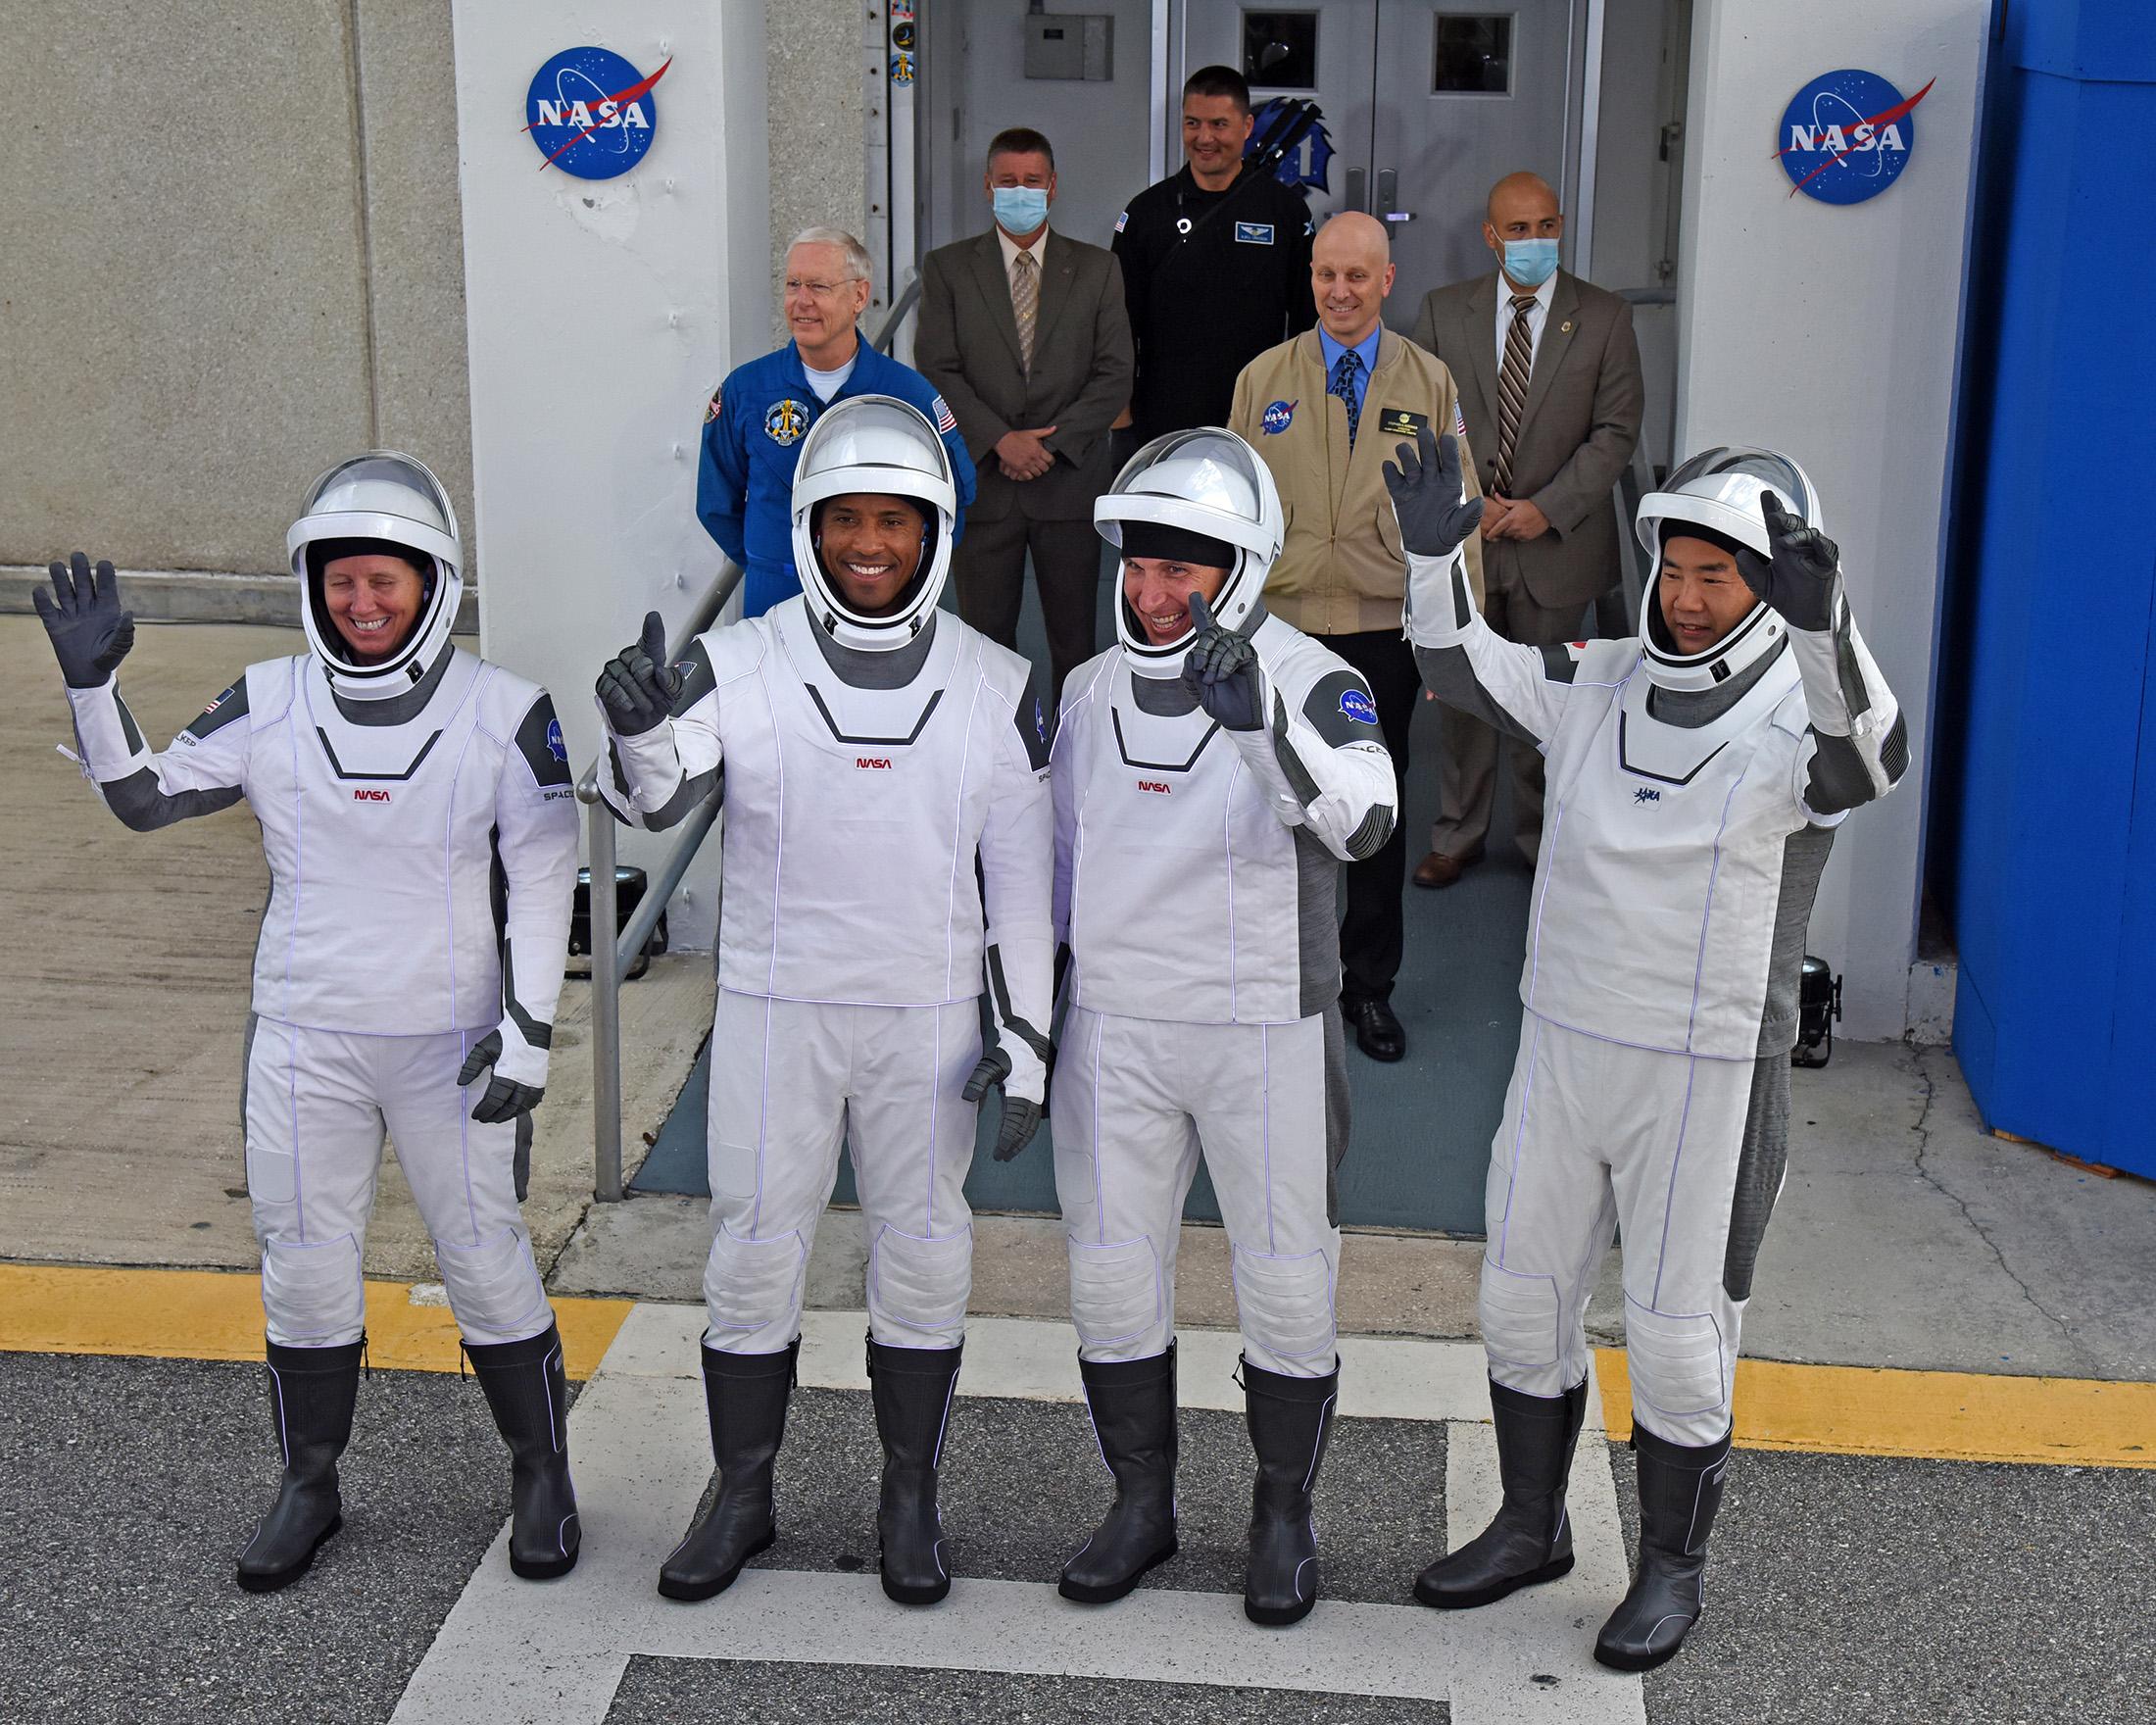 SpaceXとNASAが国際宇宙ステーションに4人の宇宙飛行士を乗せたクルードラゴンカプセルを打ち上げる